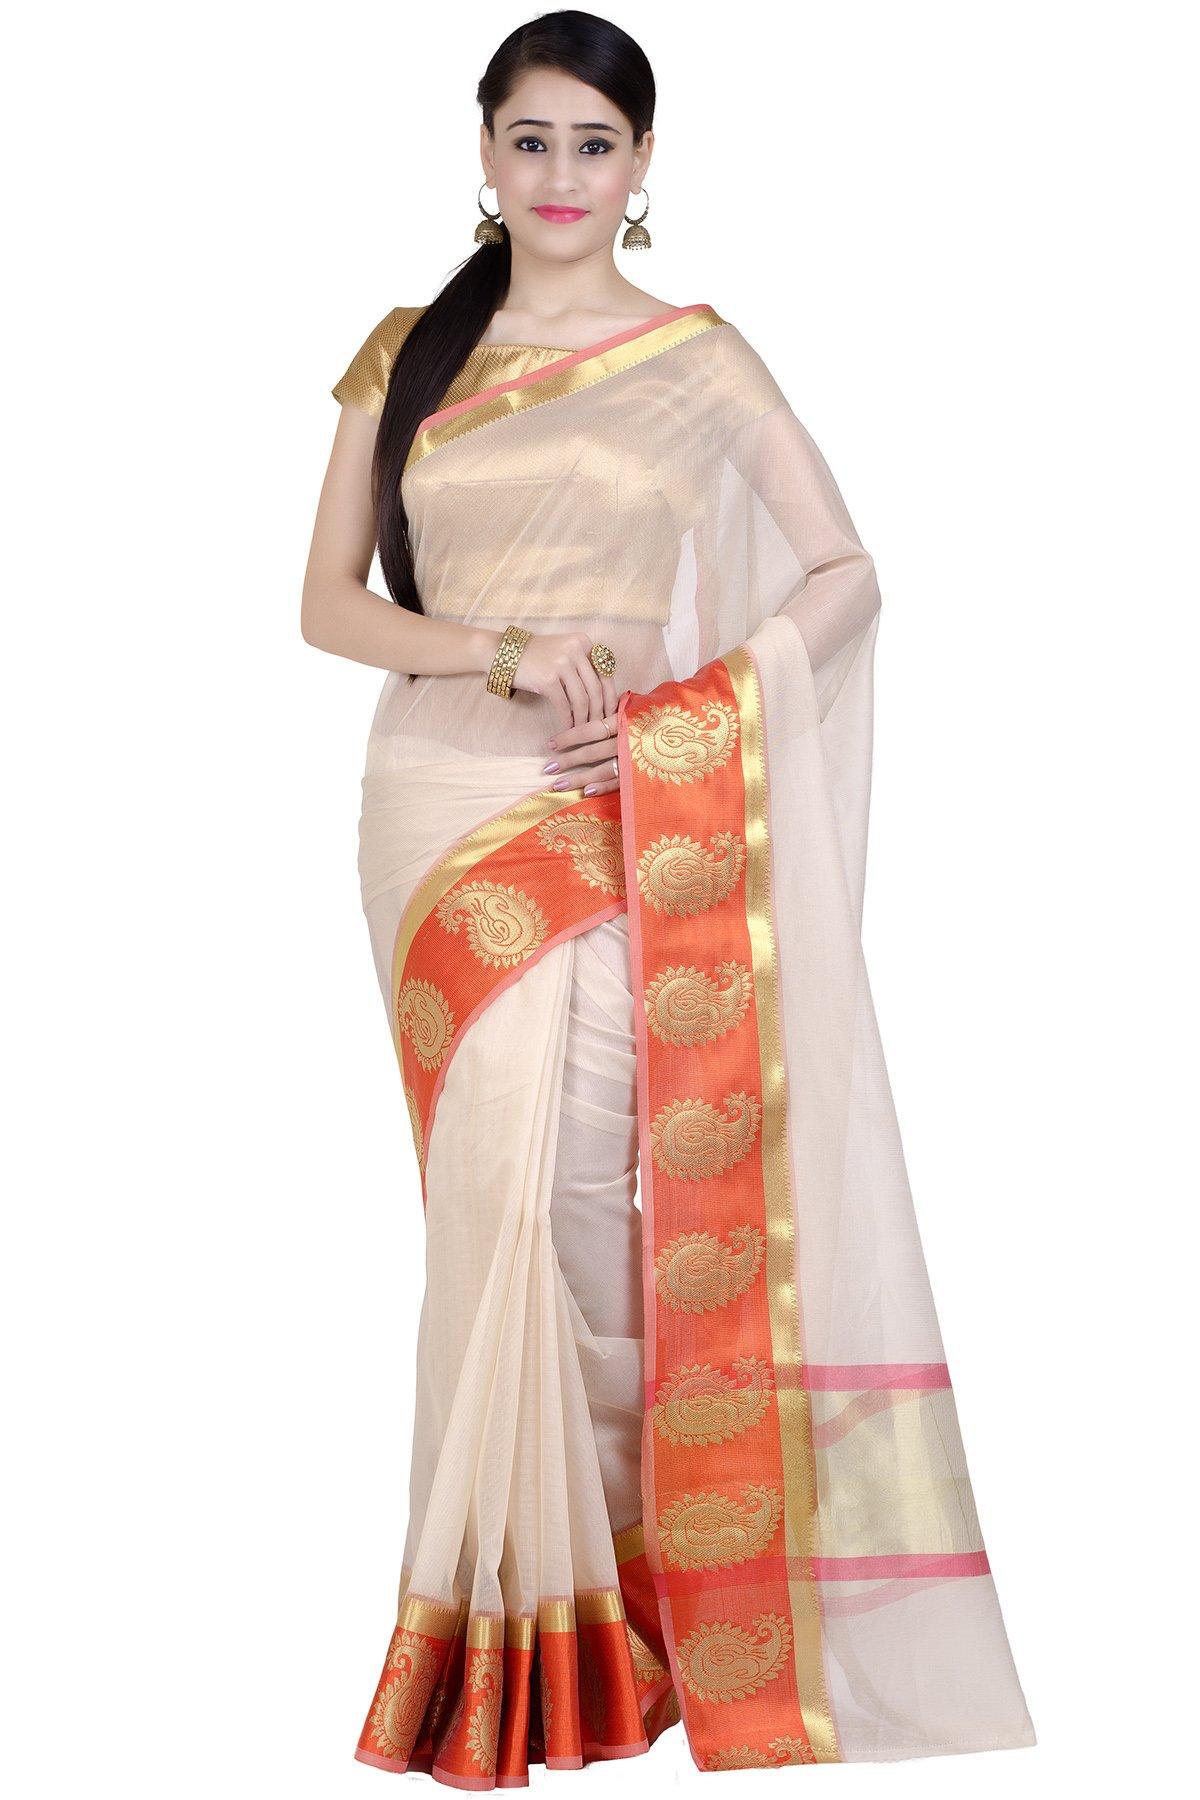 Chandrakala Women's Orange Supernet Cotton Banarasi Saree(1276ORA)